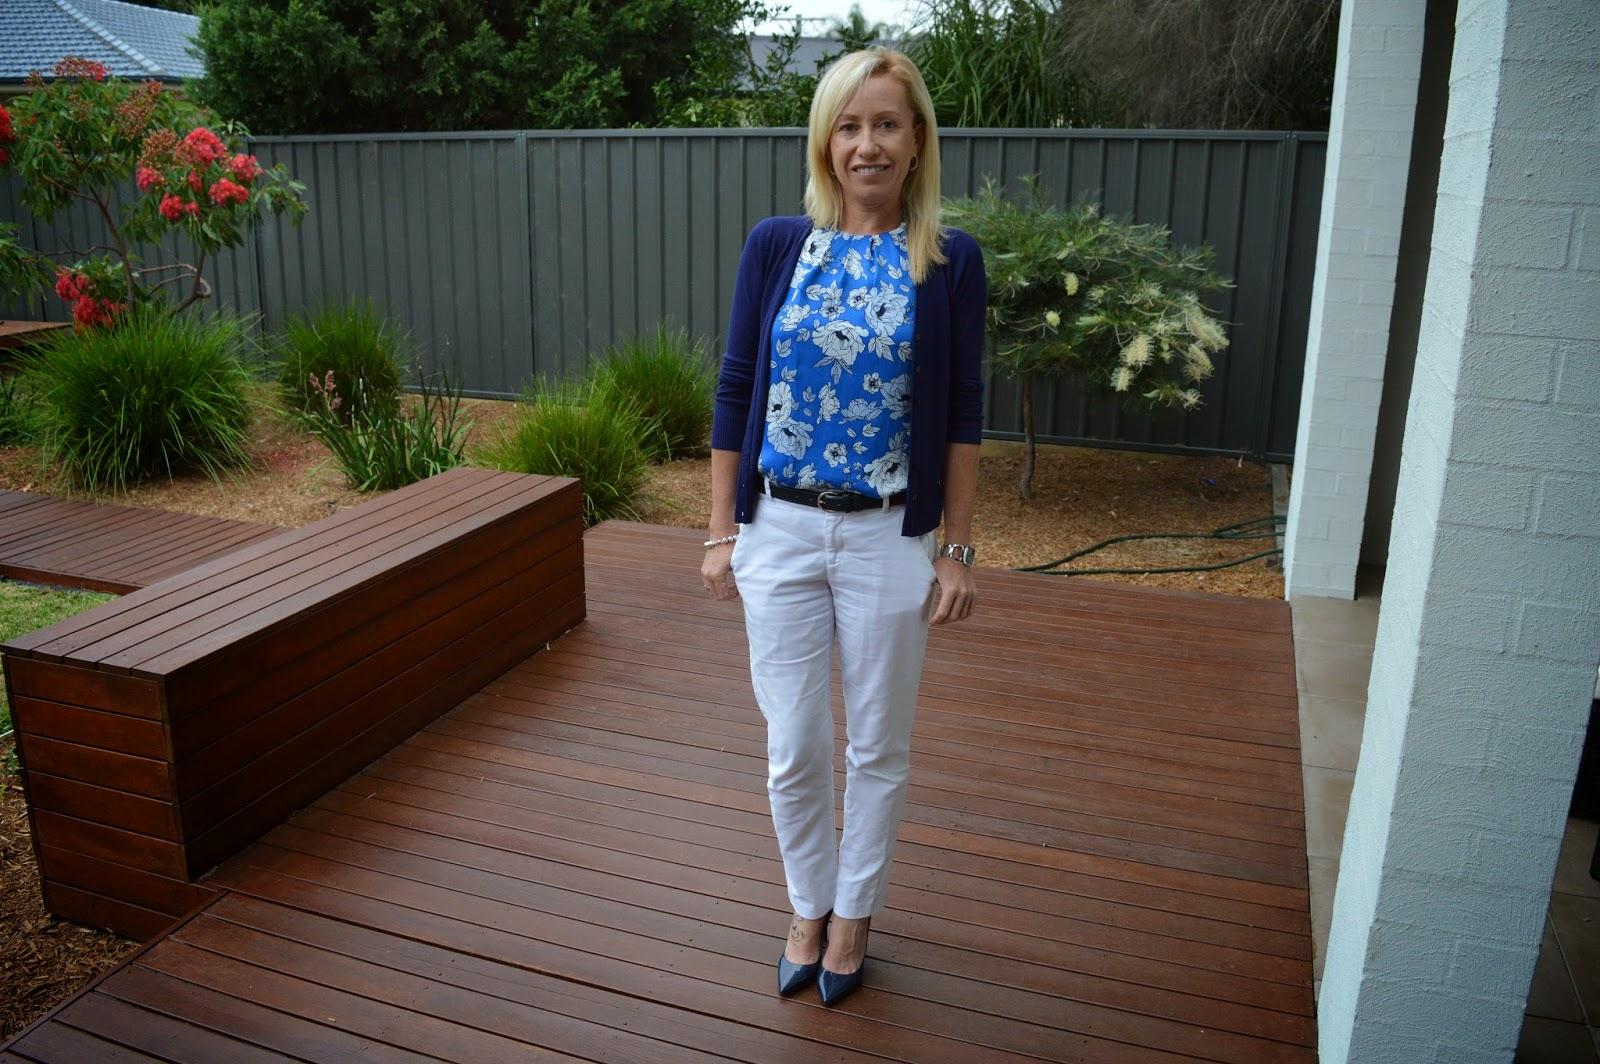 Sydney Fashion Hunter - White Pants, Blue Floral Top, Navy Pumps, Blue Dior Tote, Navy Cardigan